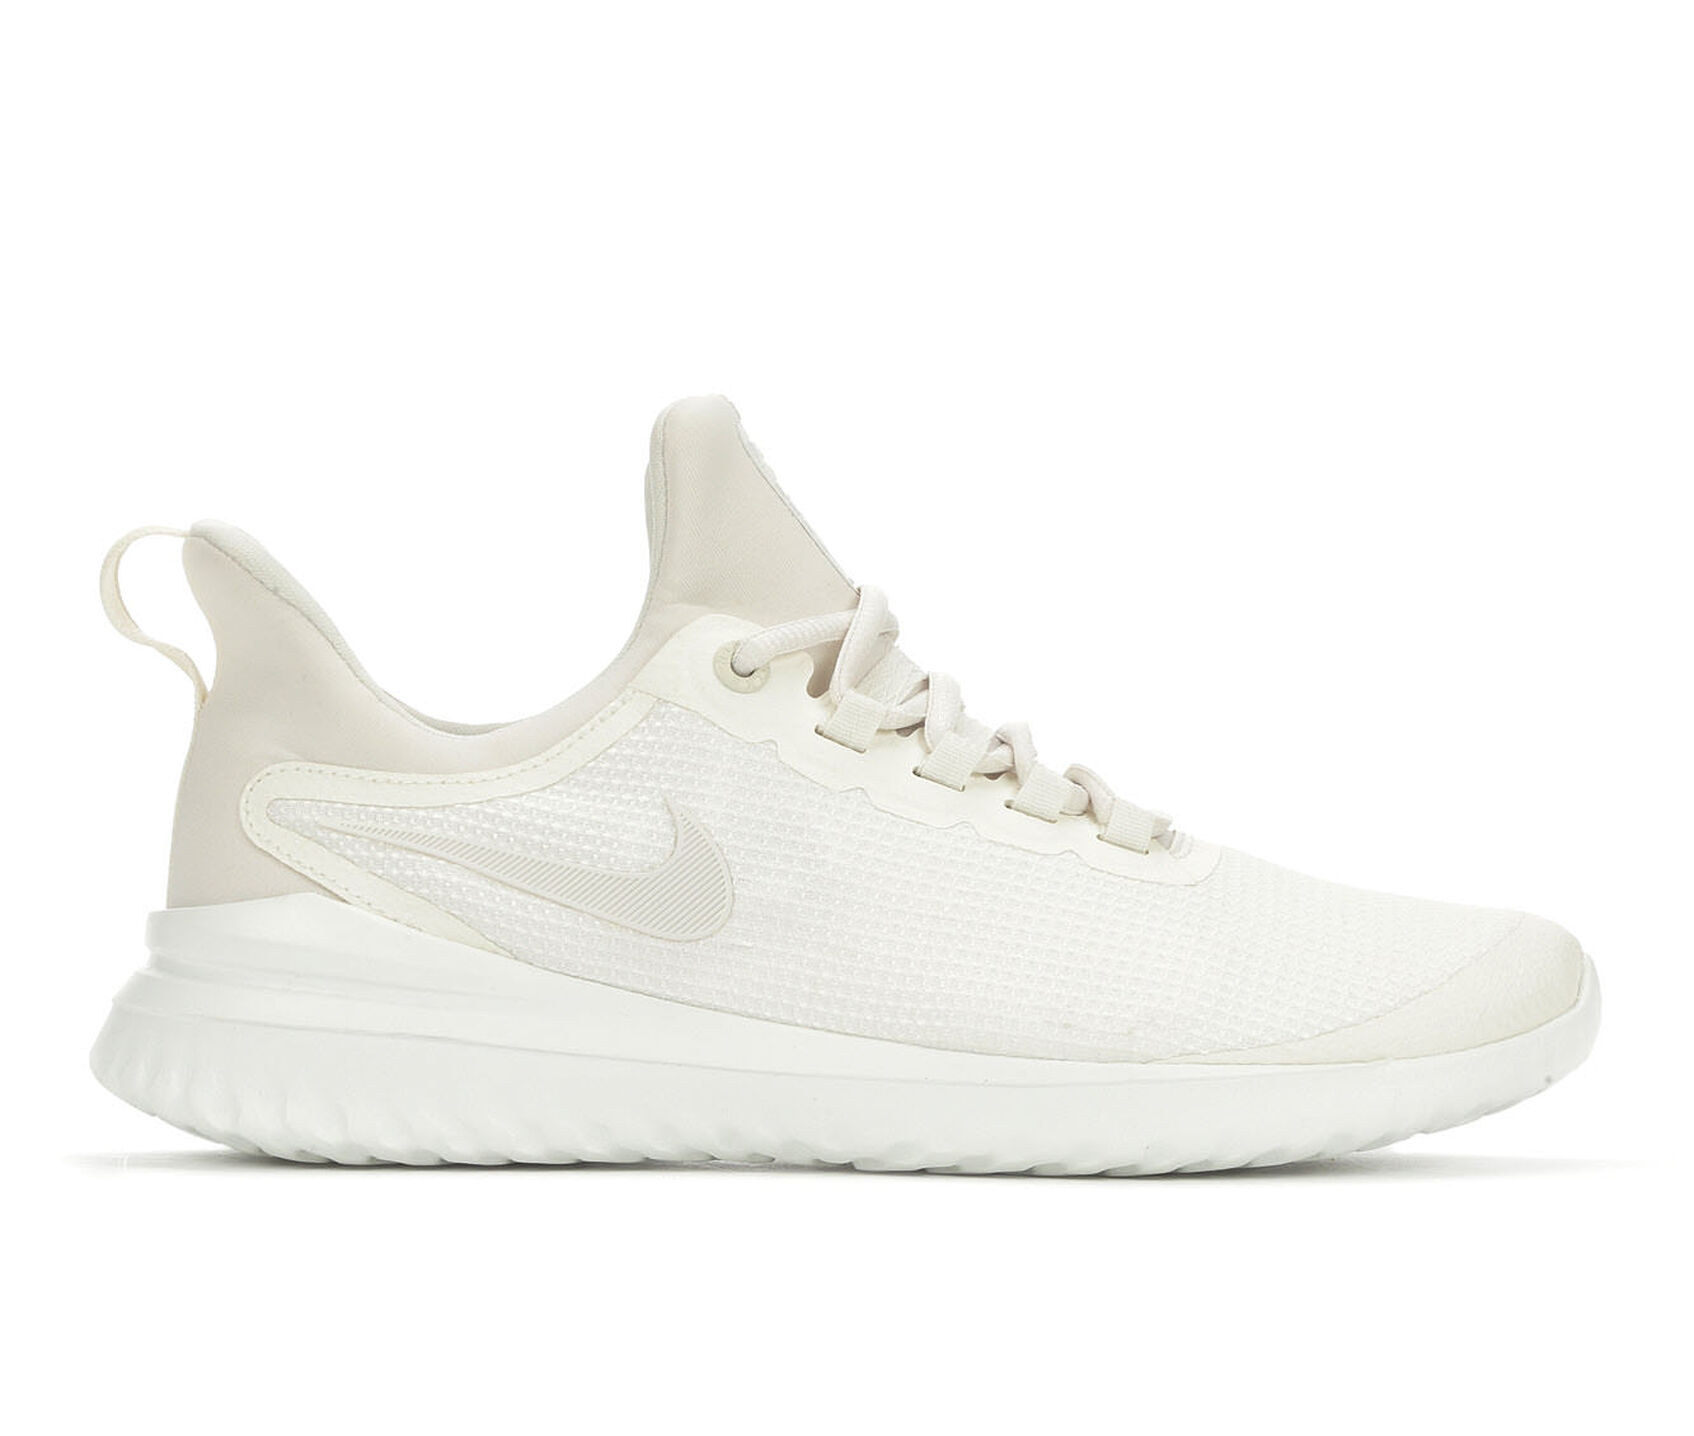 7324e10dd5c4 ... Nike Renew Rival Sneakers. Previous